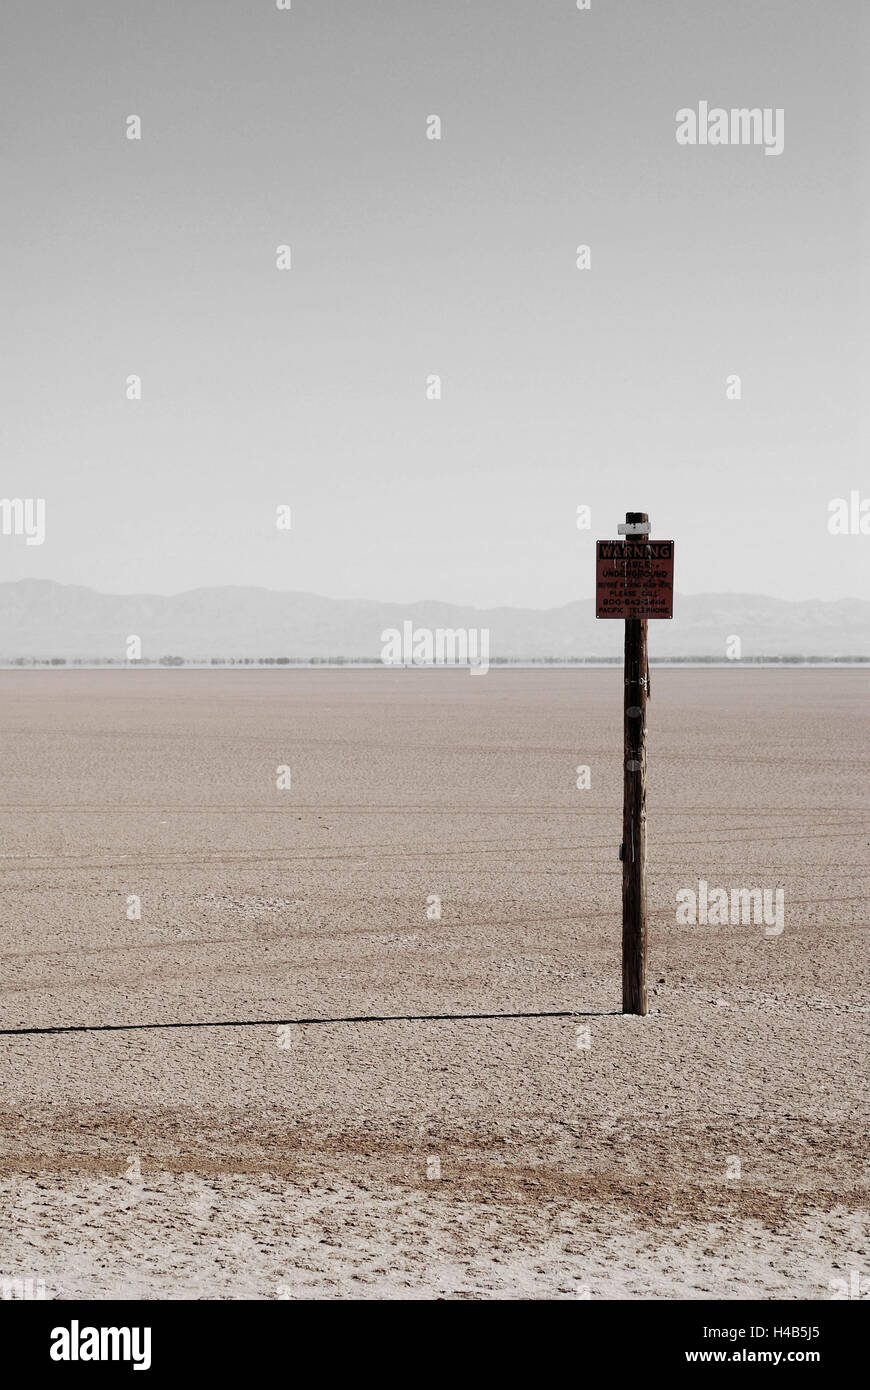 USA, California, Salt Lake, dried out, sign, - Stock Image